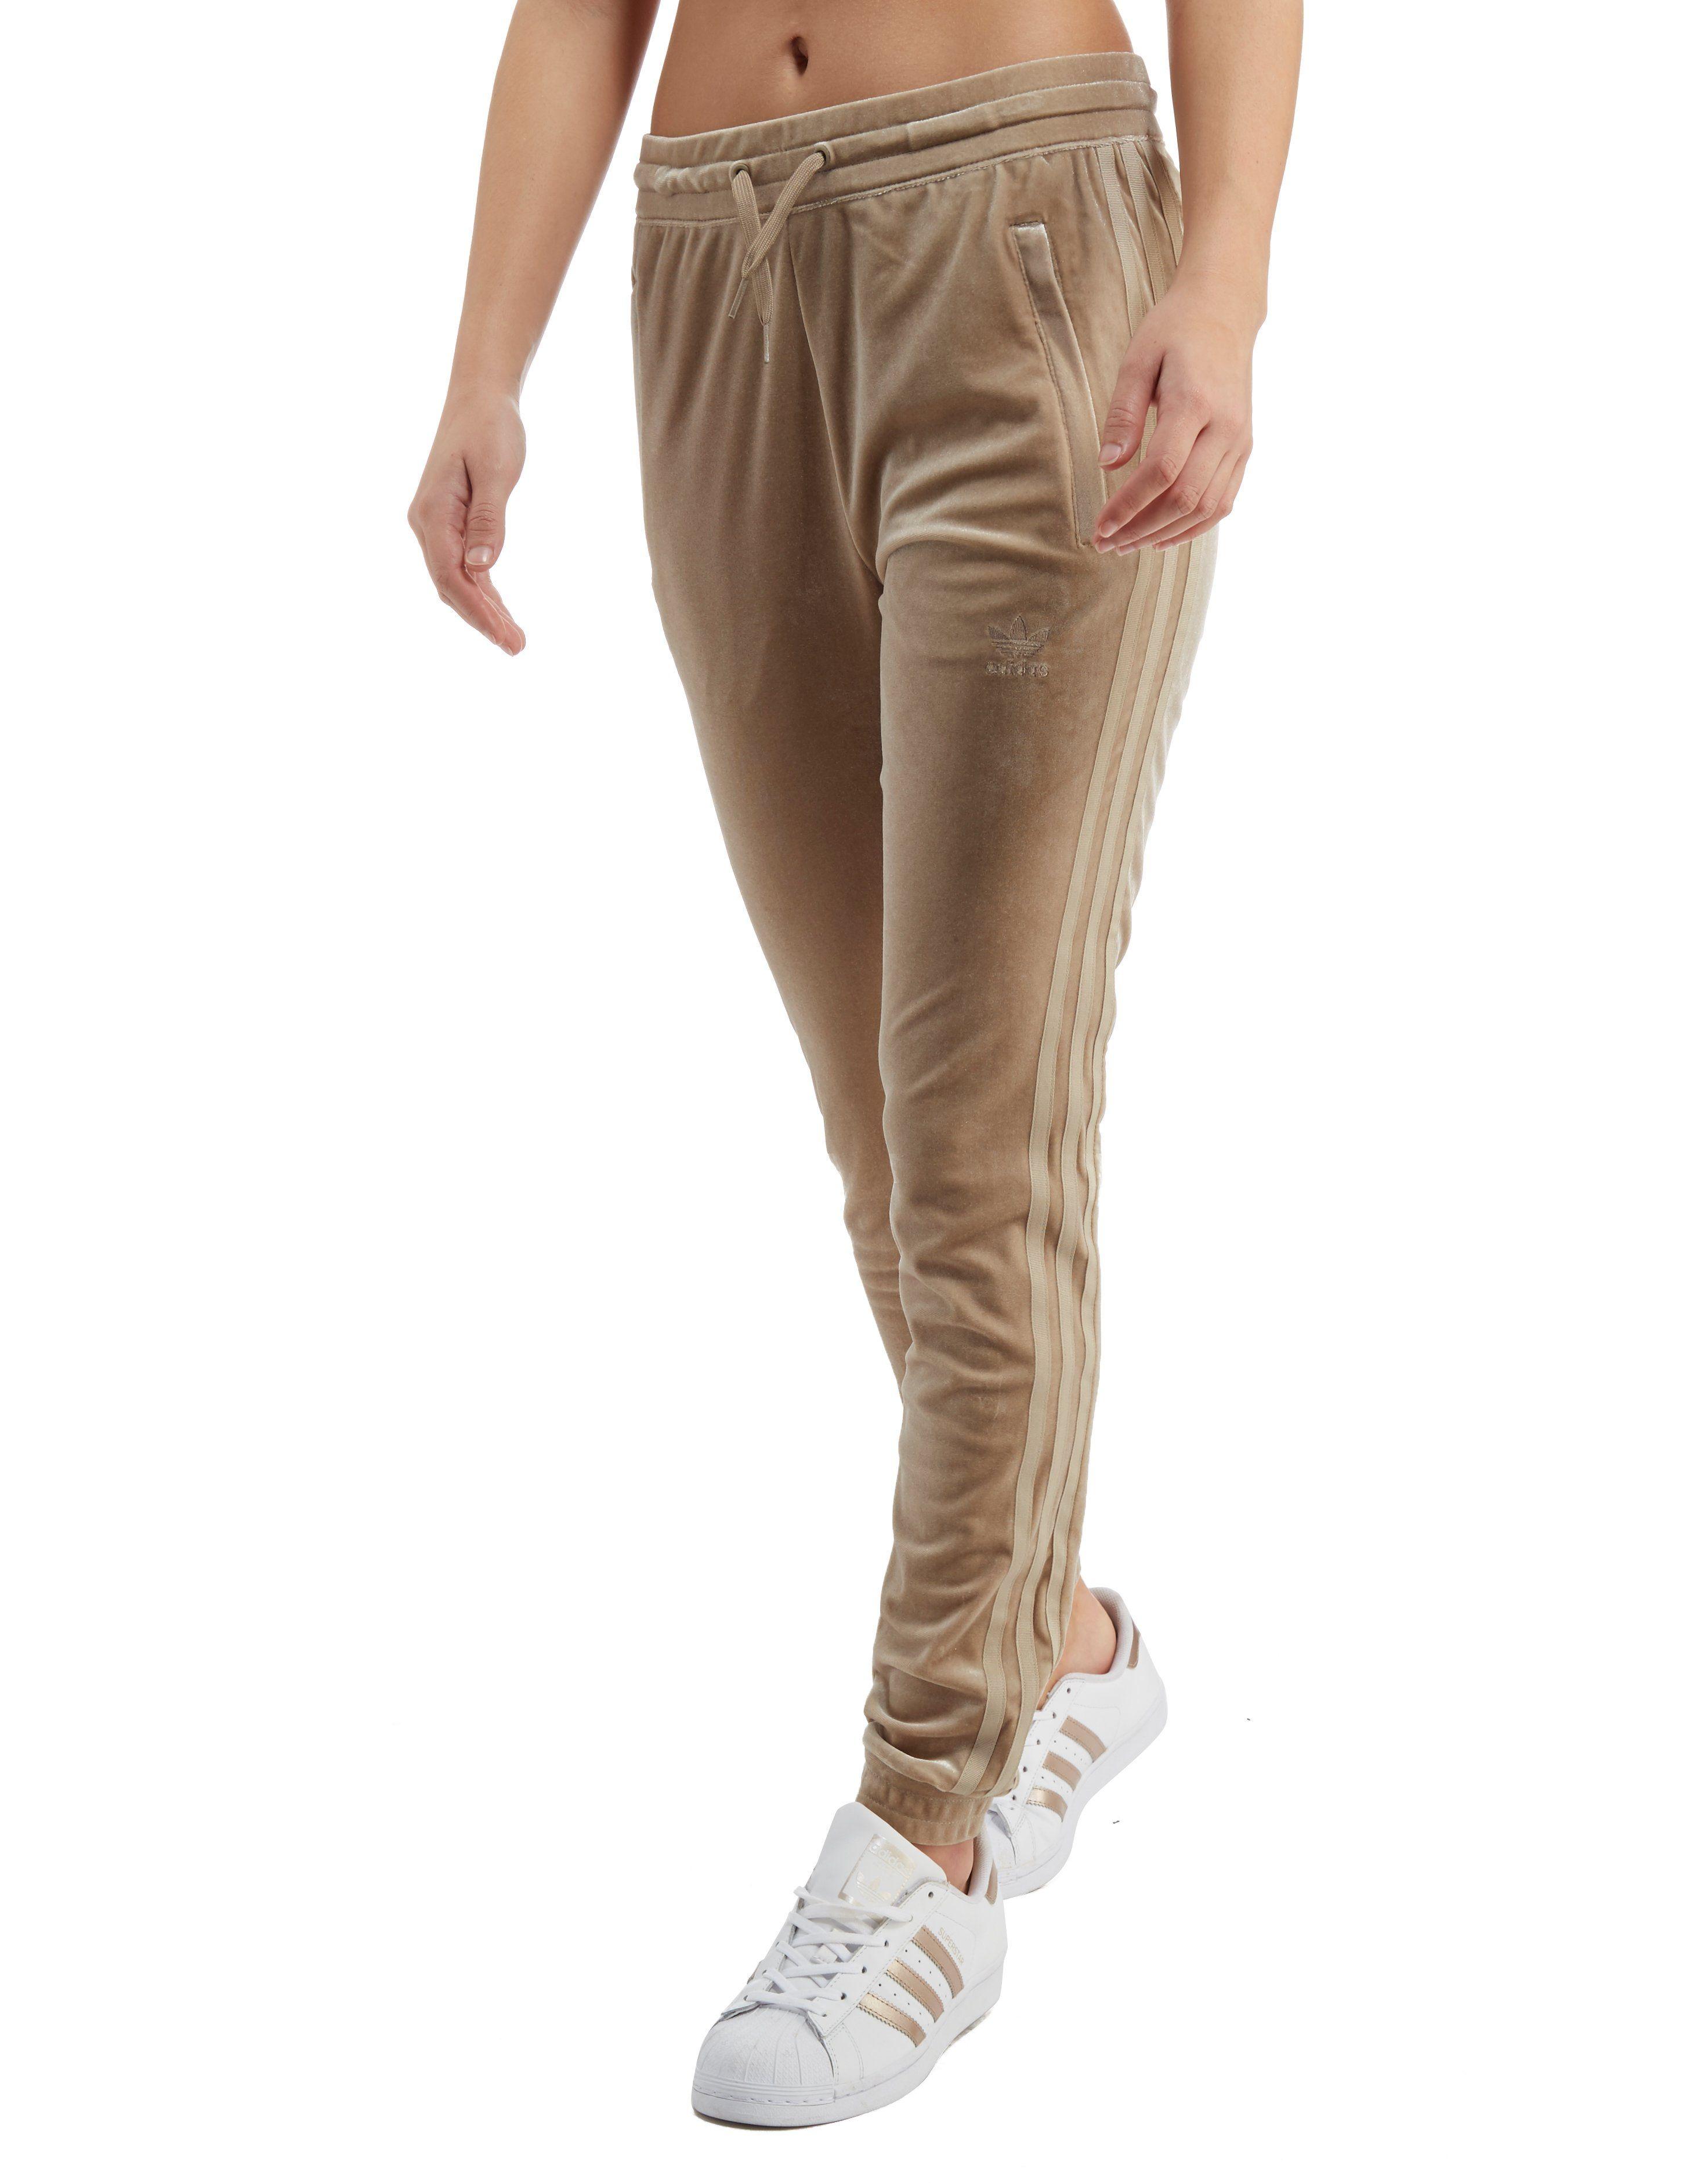 6c75ce71ed16 adidas Originals Velvet Vibes SST Track Pants